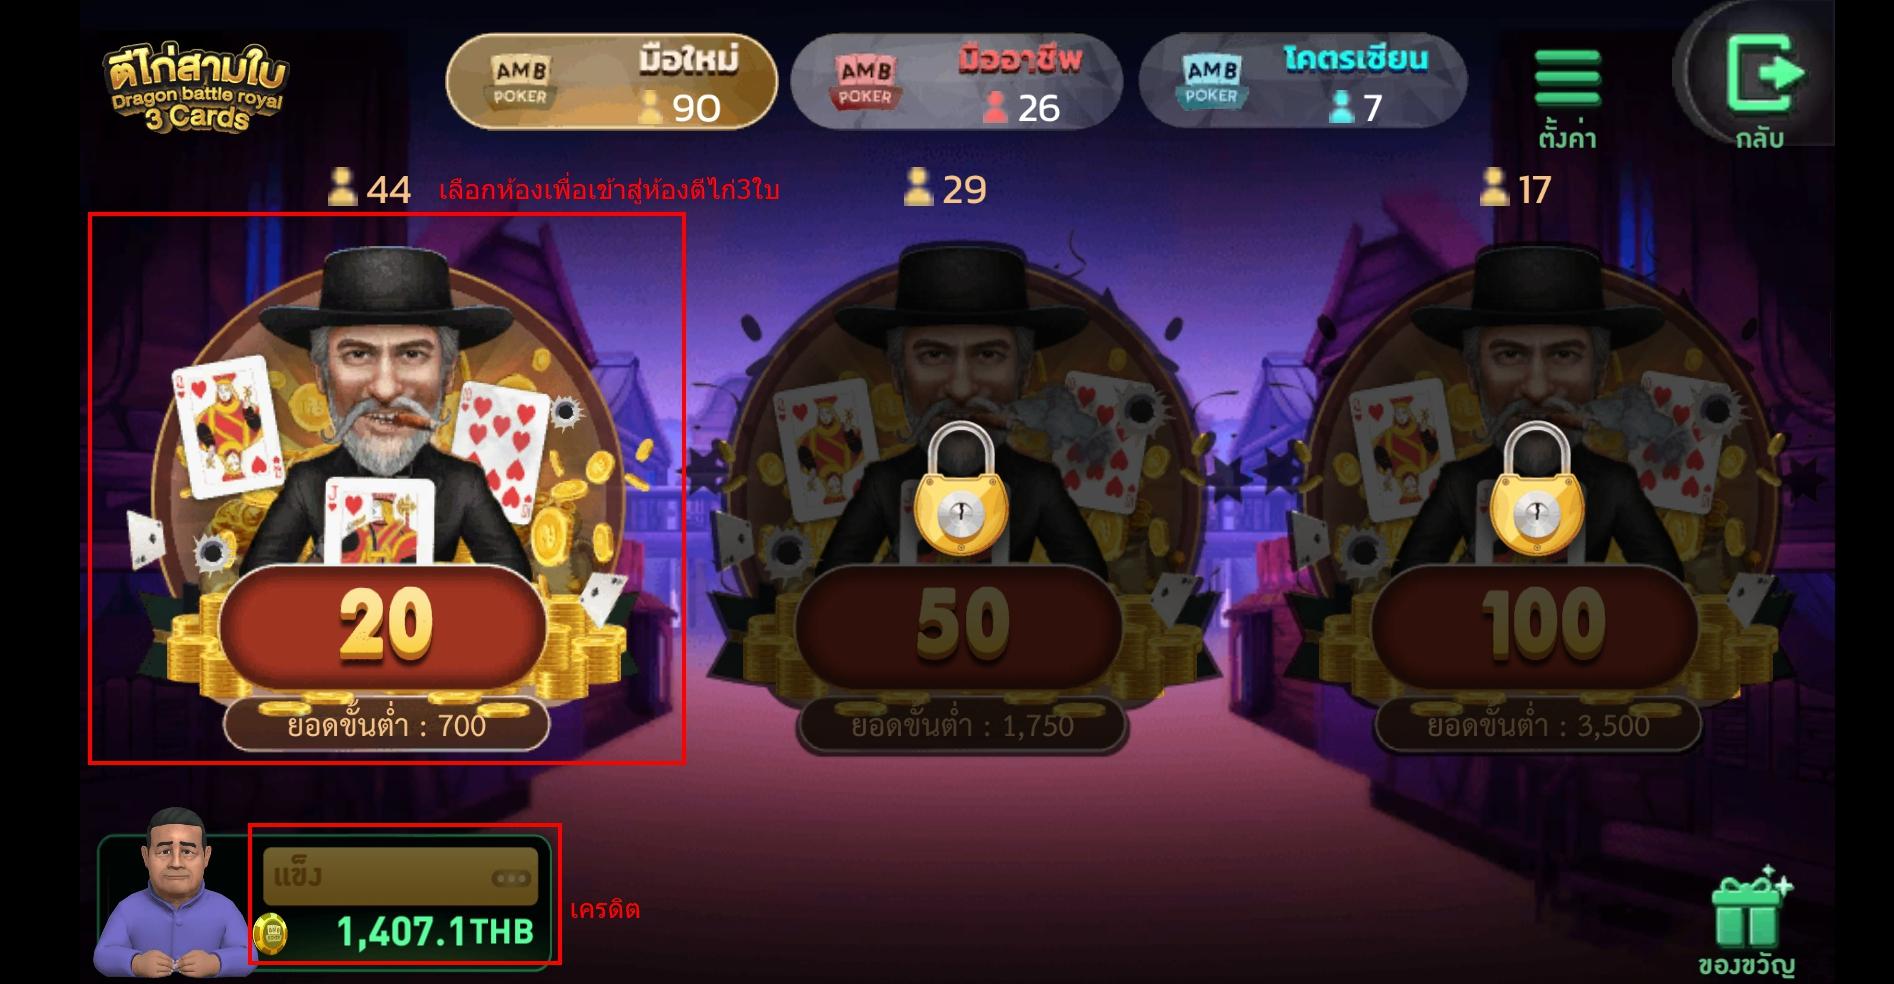 play game dragon battle royal 3 cards3